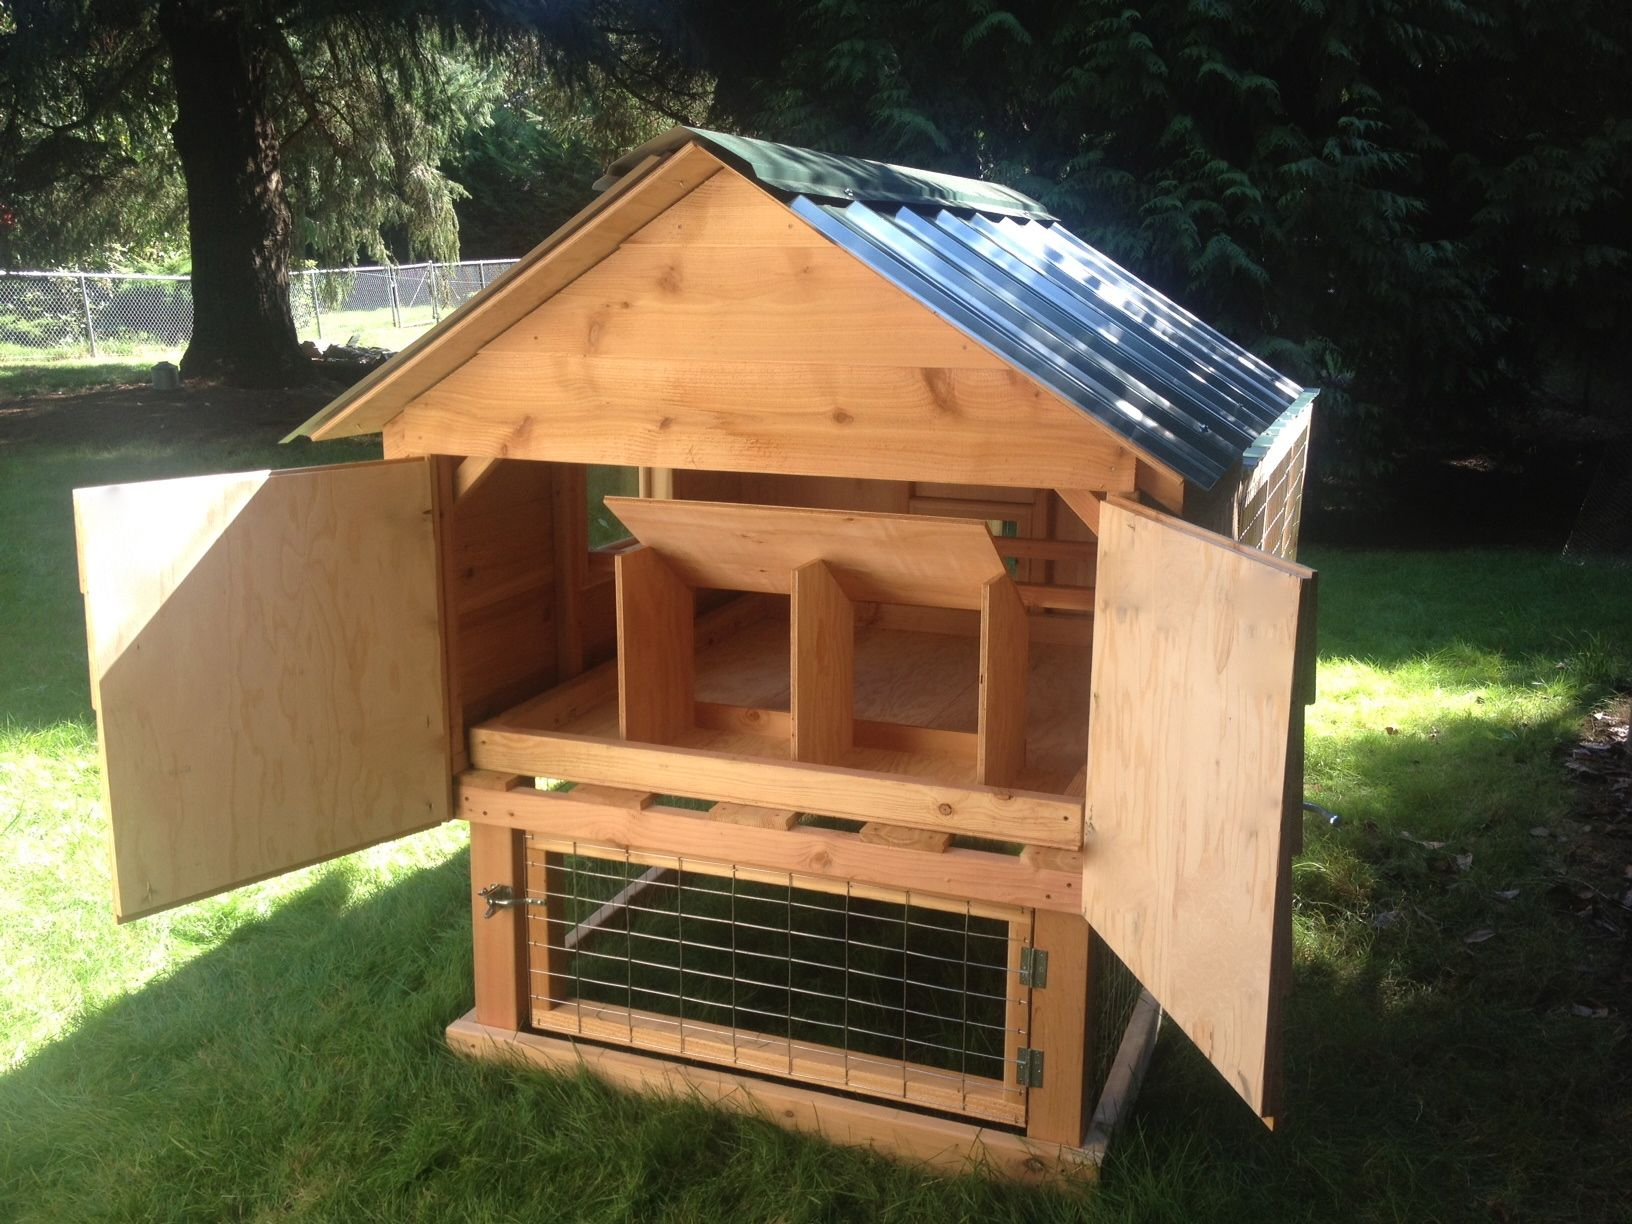 raising backyard chickens diy chicken coop plans diy chicken